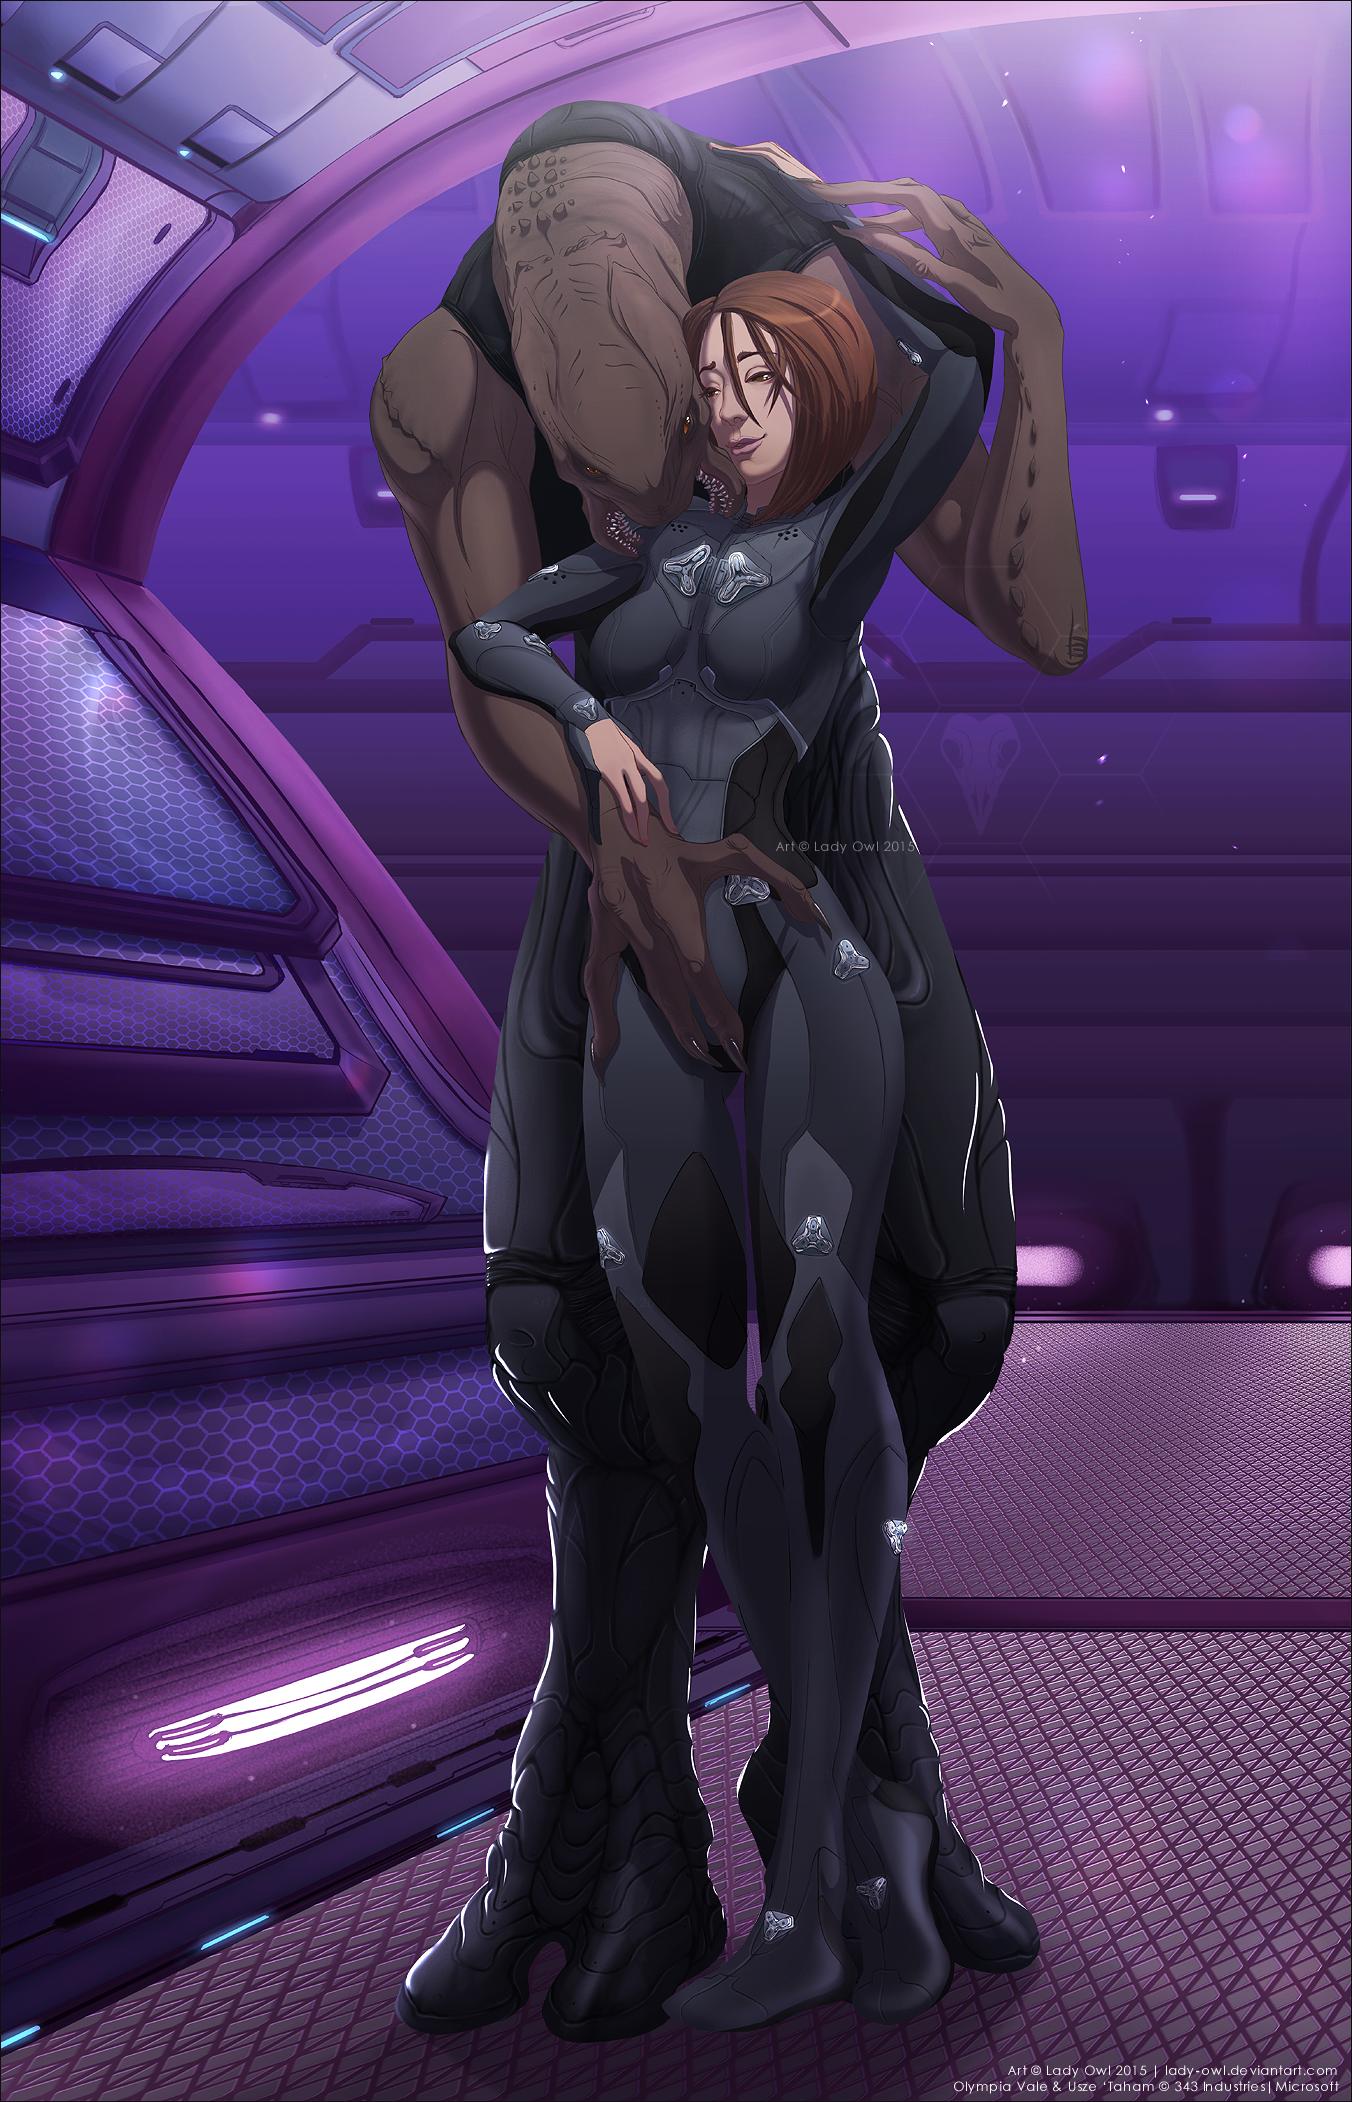 Halo 5 vale hentai nudes scenes